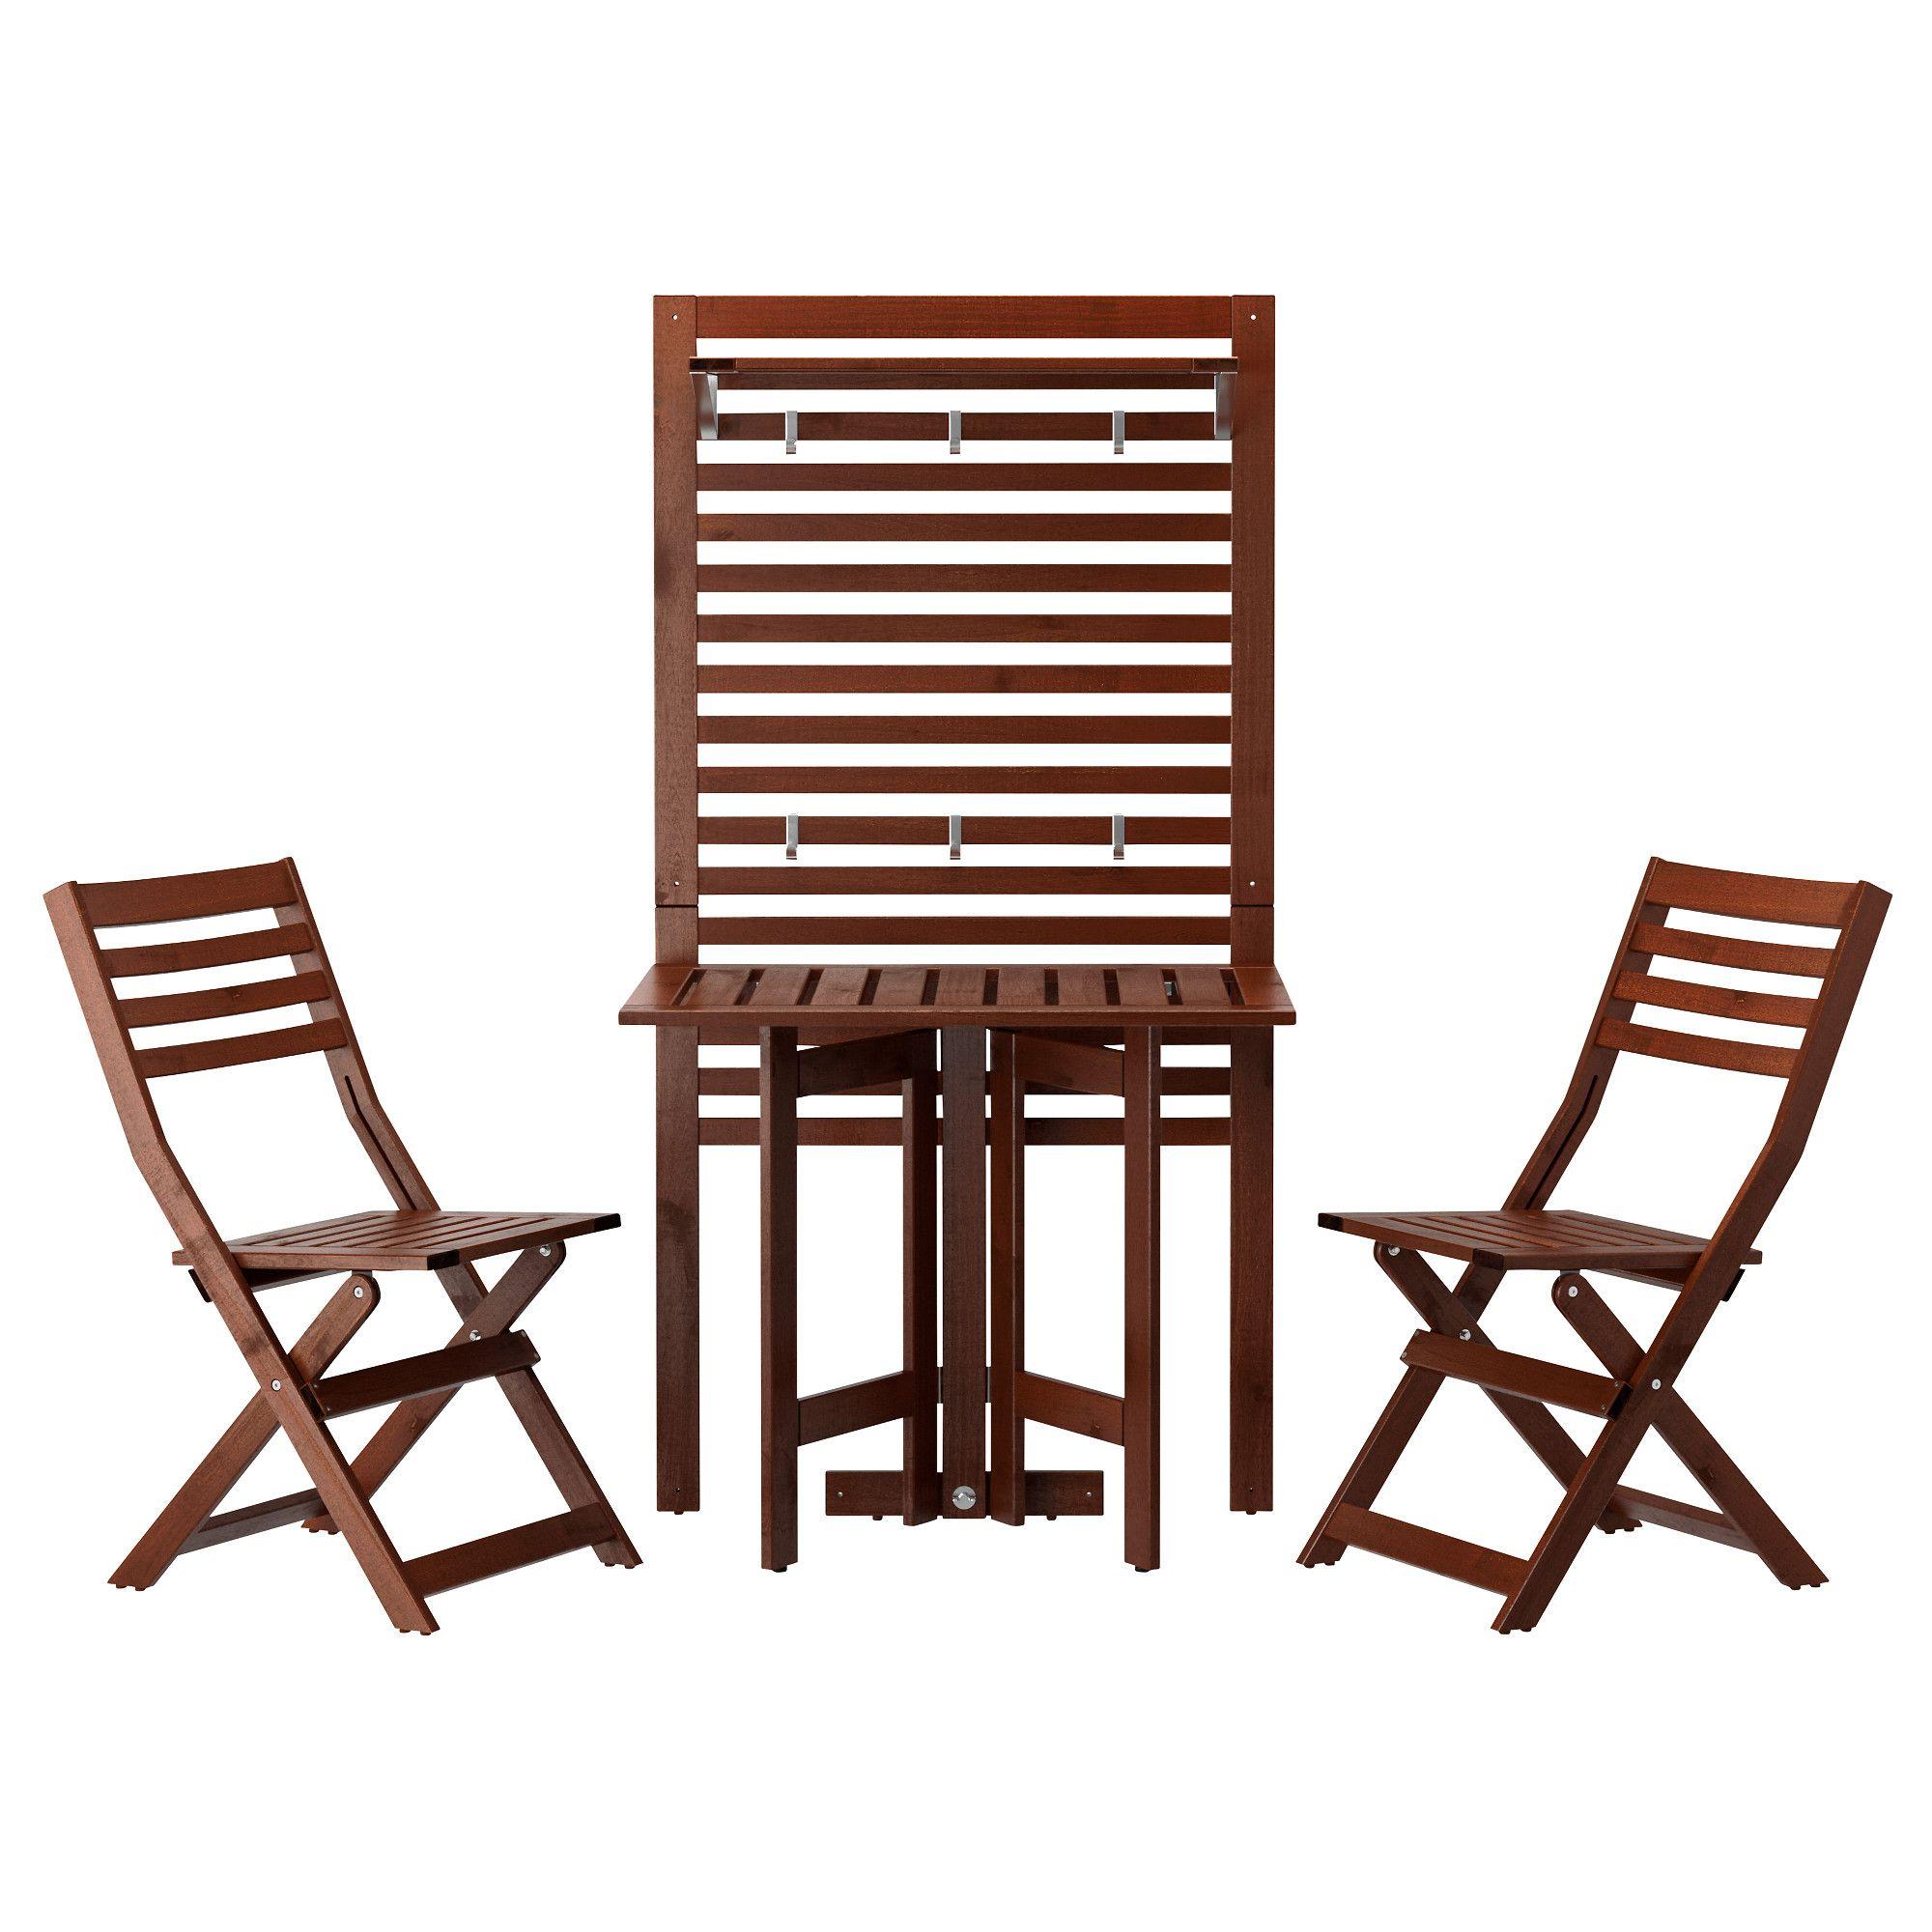 Ikea gartenmöbel äpplarö  ÄPPLARÖ, Wandpaneel+Klappti+2 Klappst, für draußen, Jetzt ...